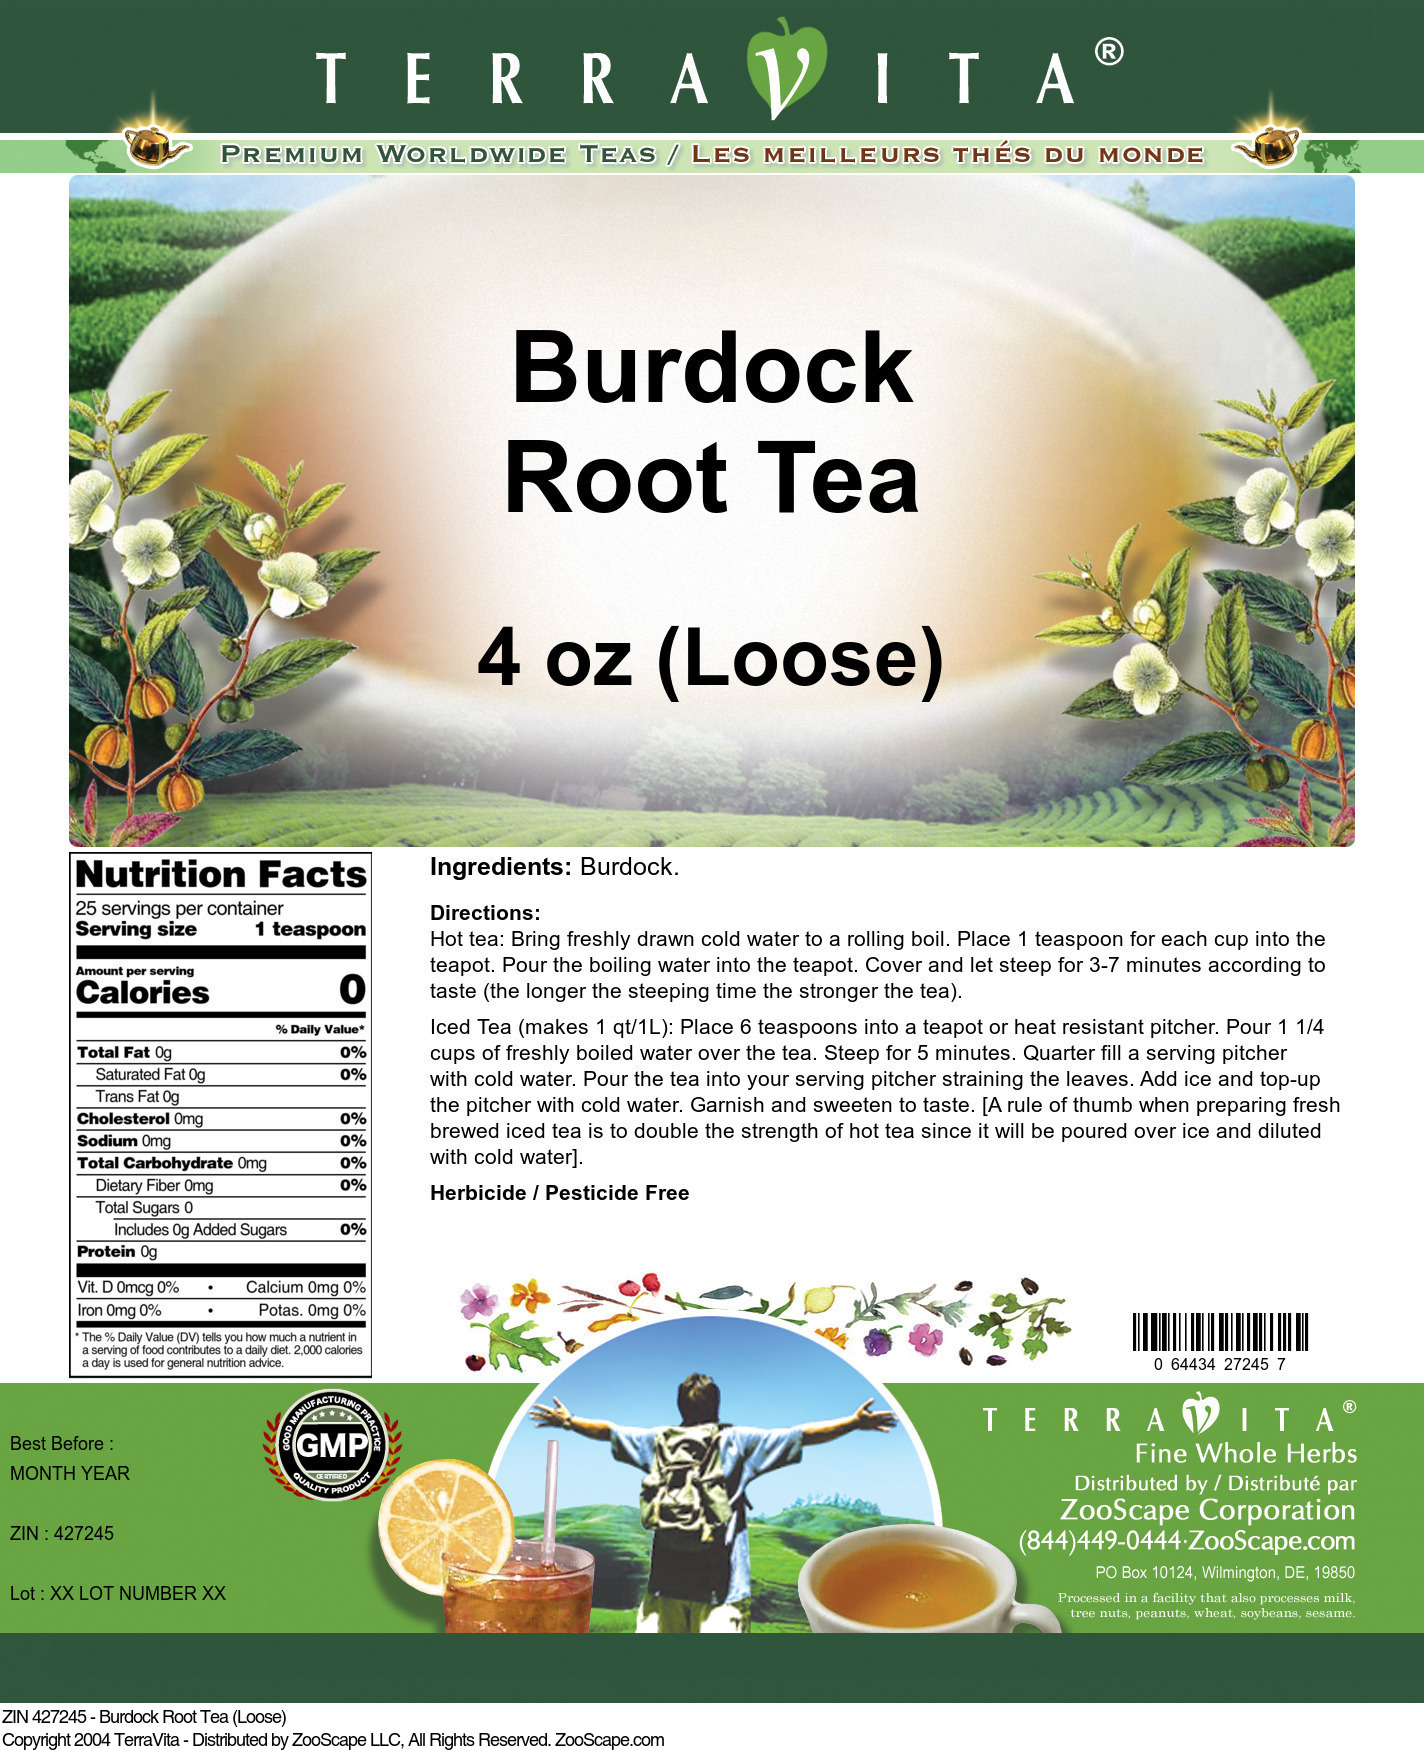 Burdock Root Tea (Loose) - Label